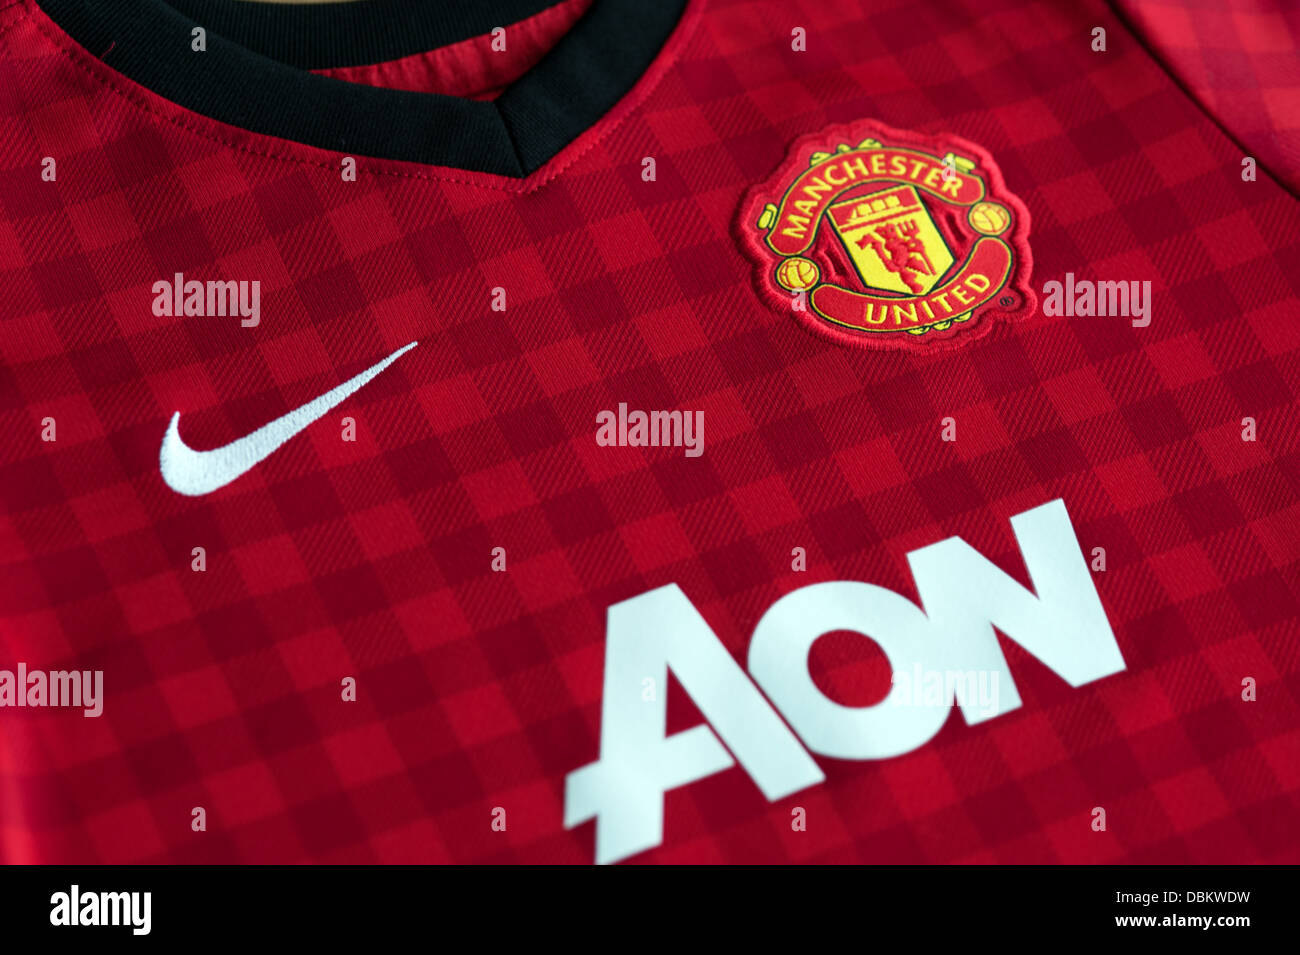 sale retailer 51ff6 dec16 Manchester United Replica Kit Stock Photo: 58829397 - Alamy